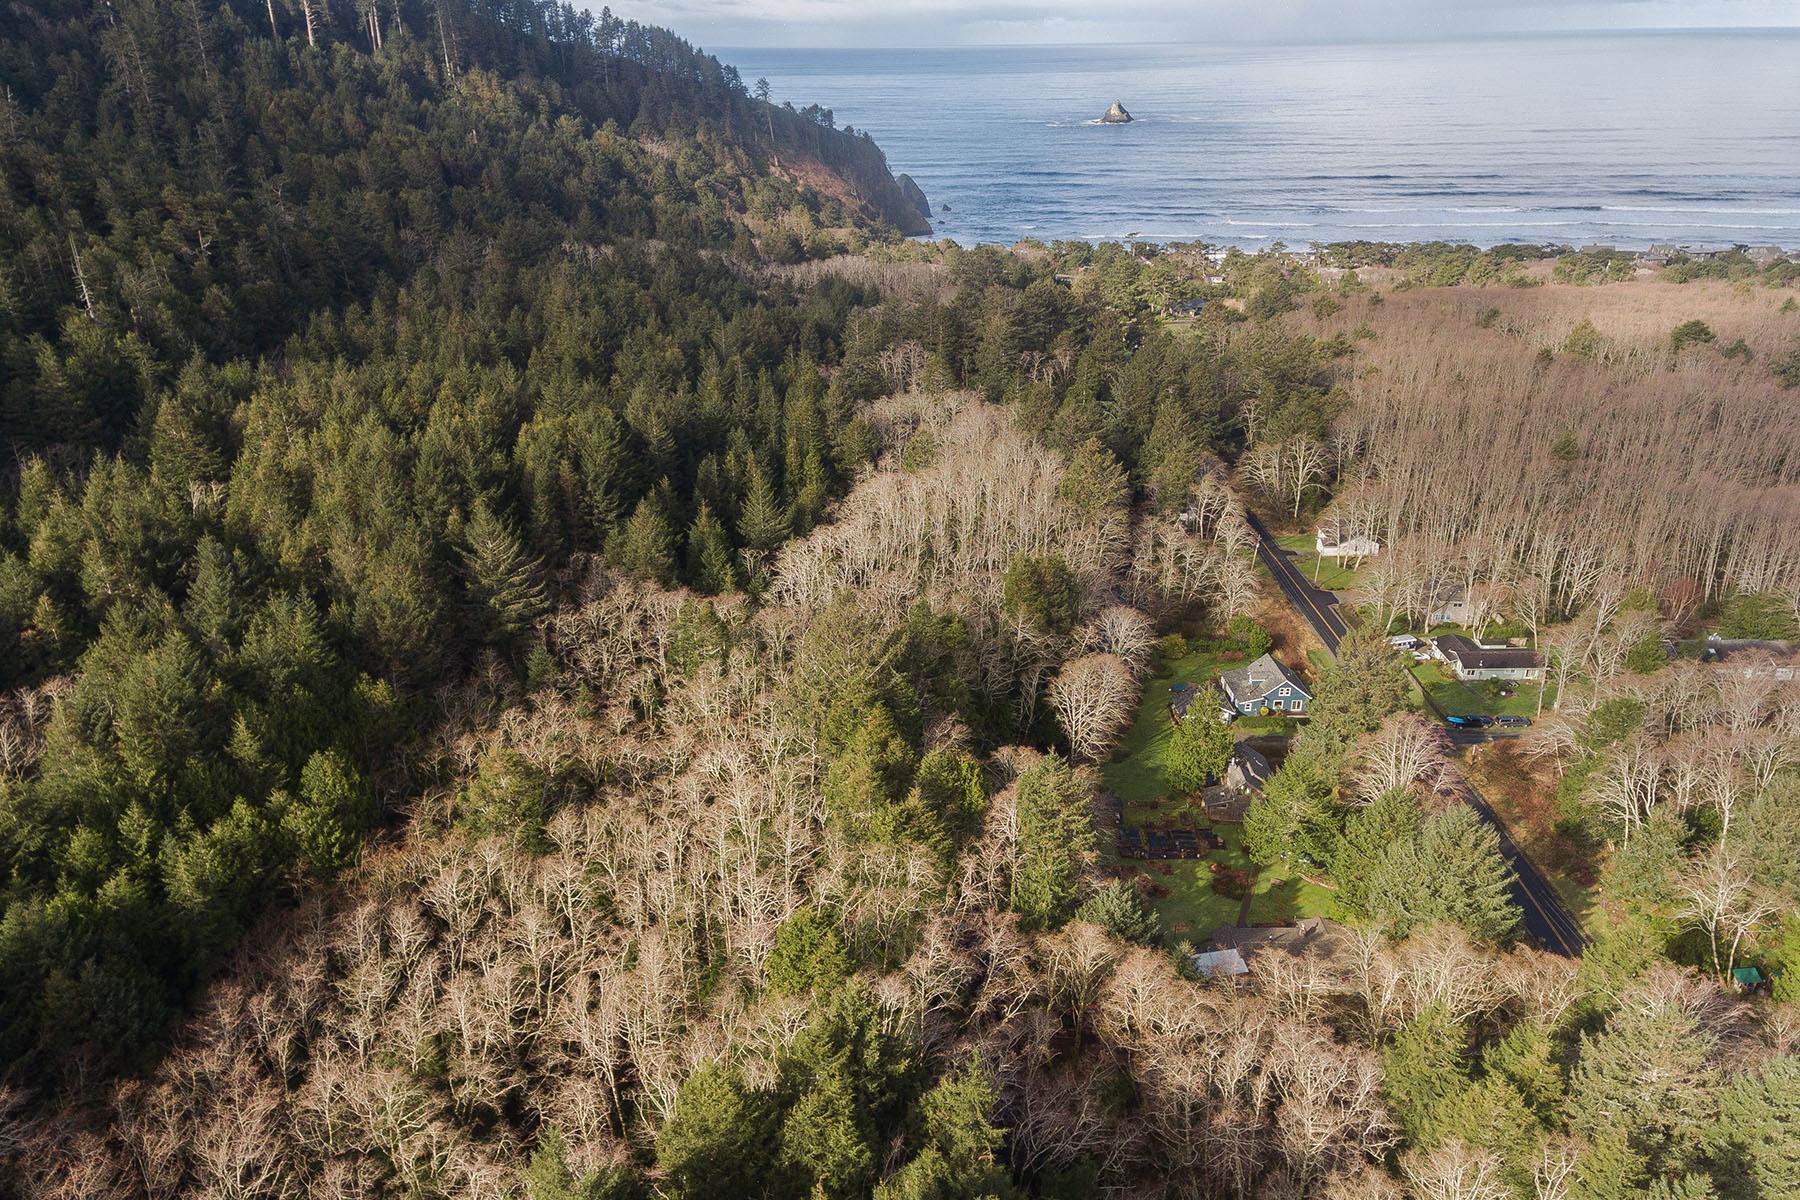 Đất đai vì Bán tại Shingle Mill LN, ARCH CAPE Arch Cape, Oregon, 97102 Hoa Kỳ